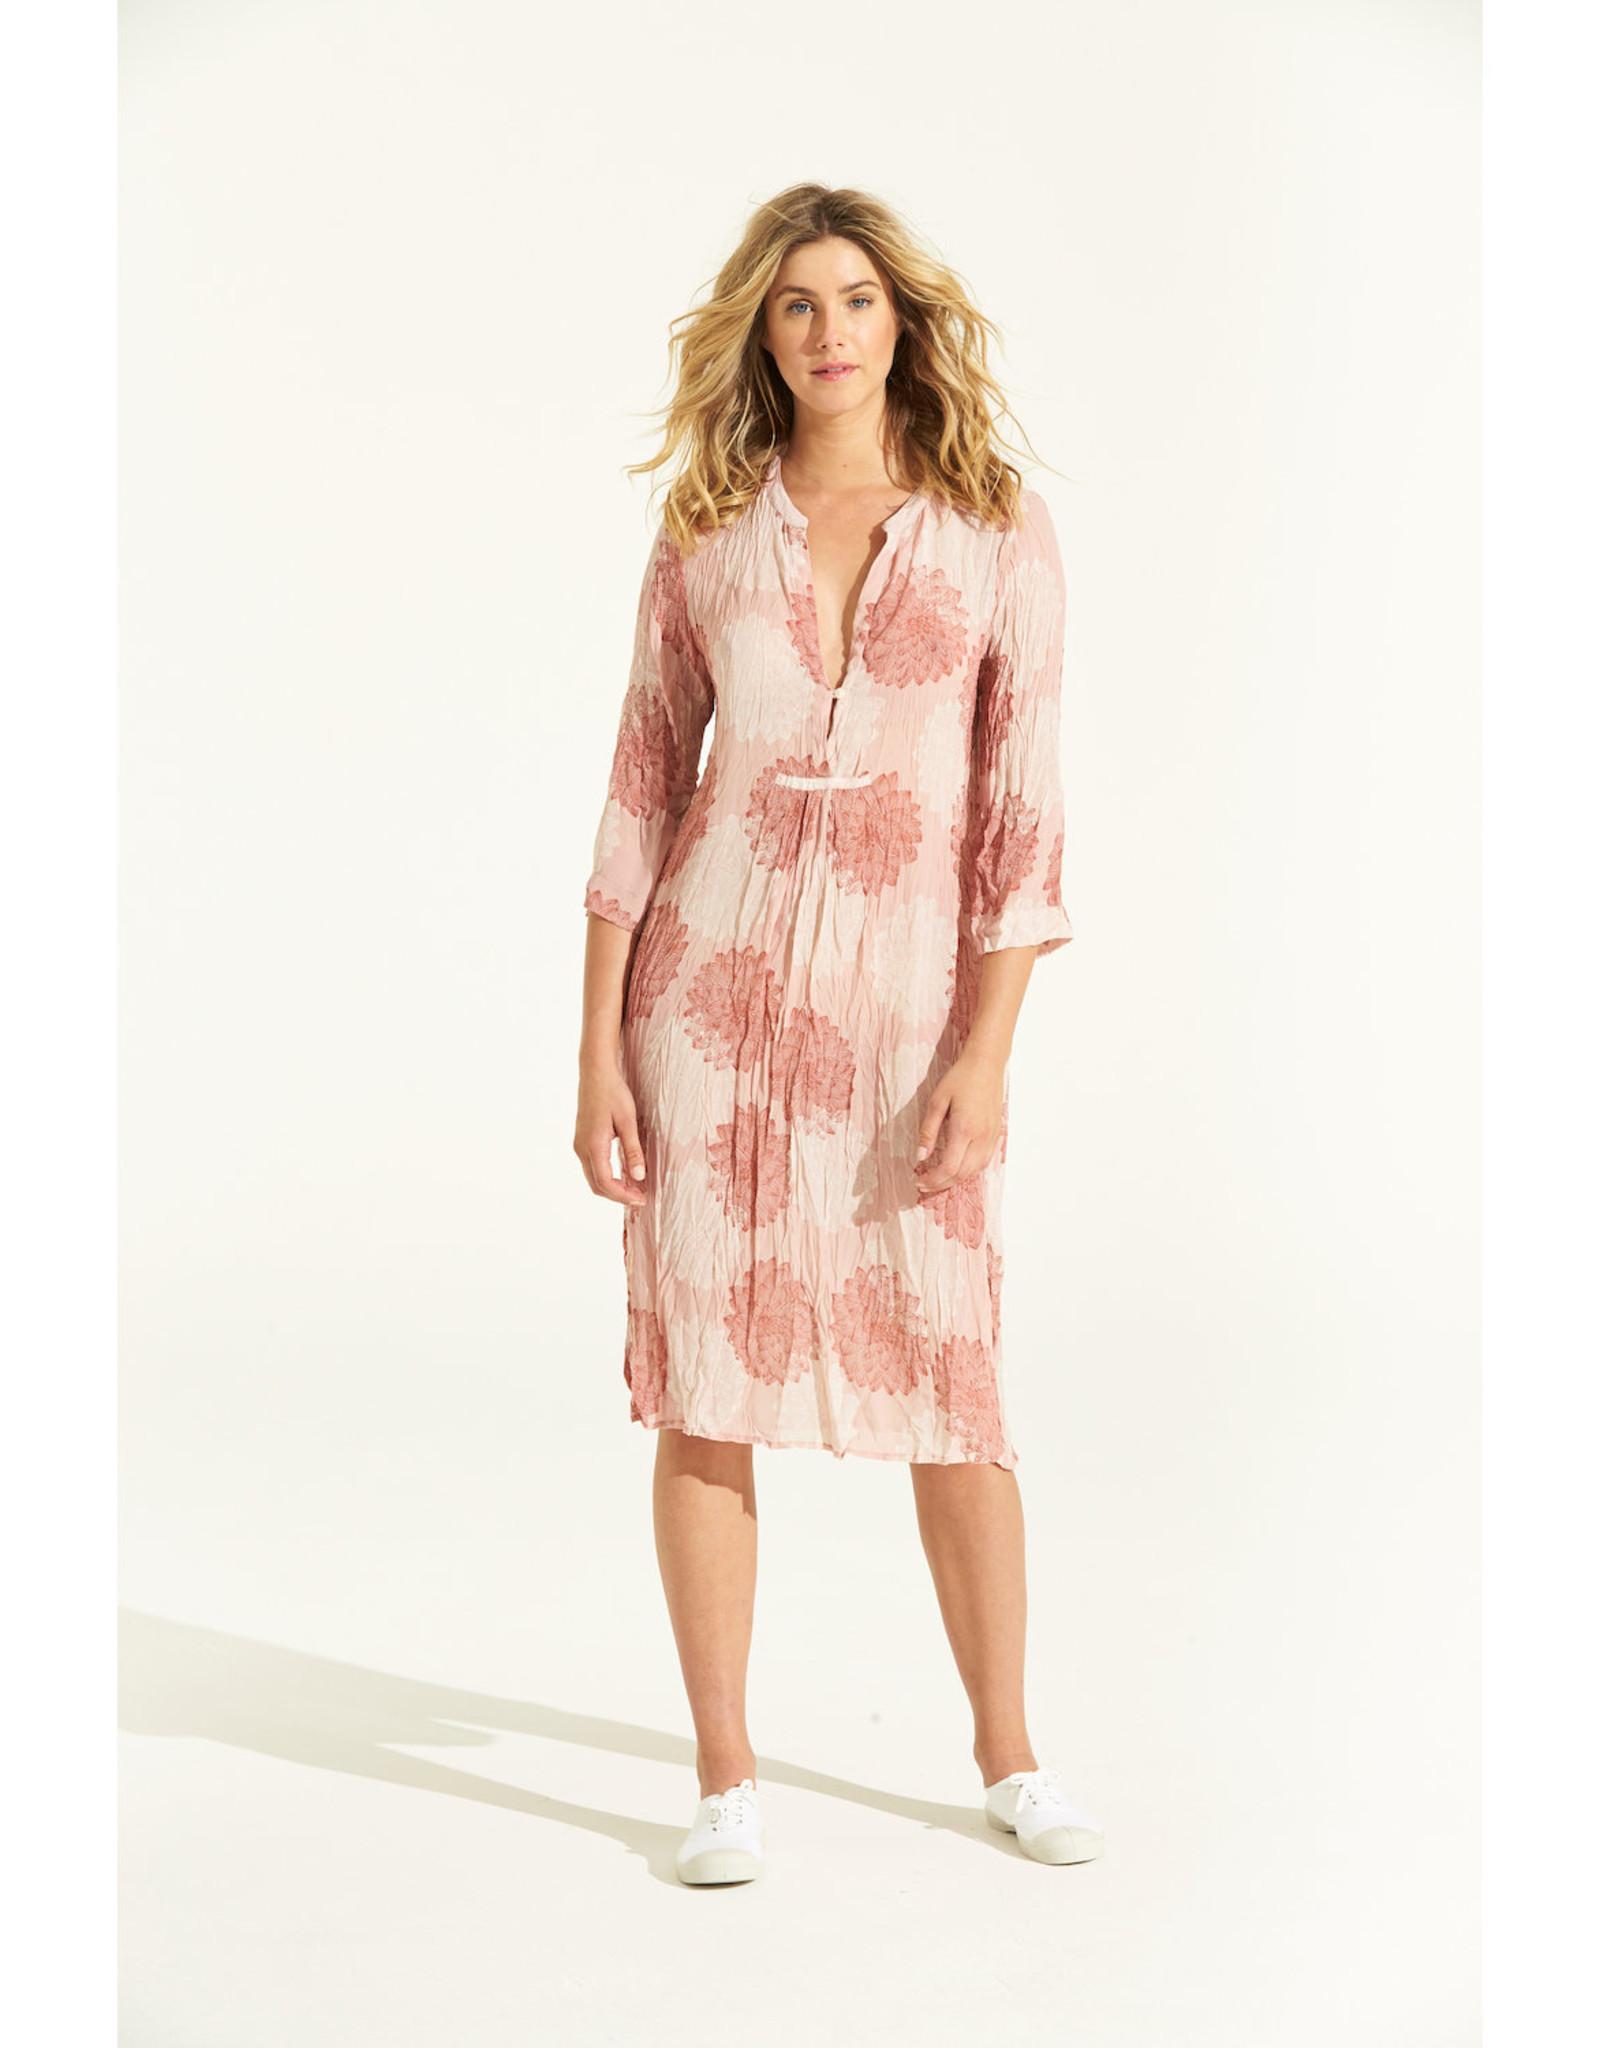 SALE - ONESEASON PAPY DRESS SICILY TERRACOTTA